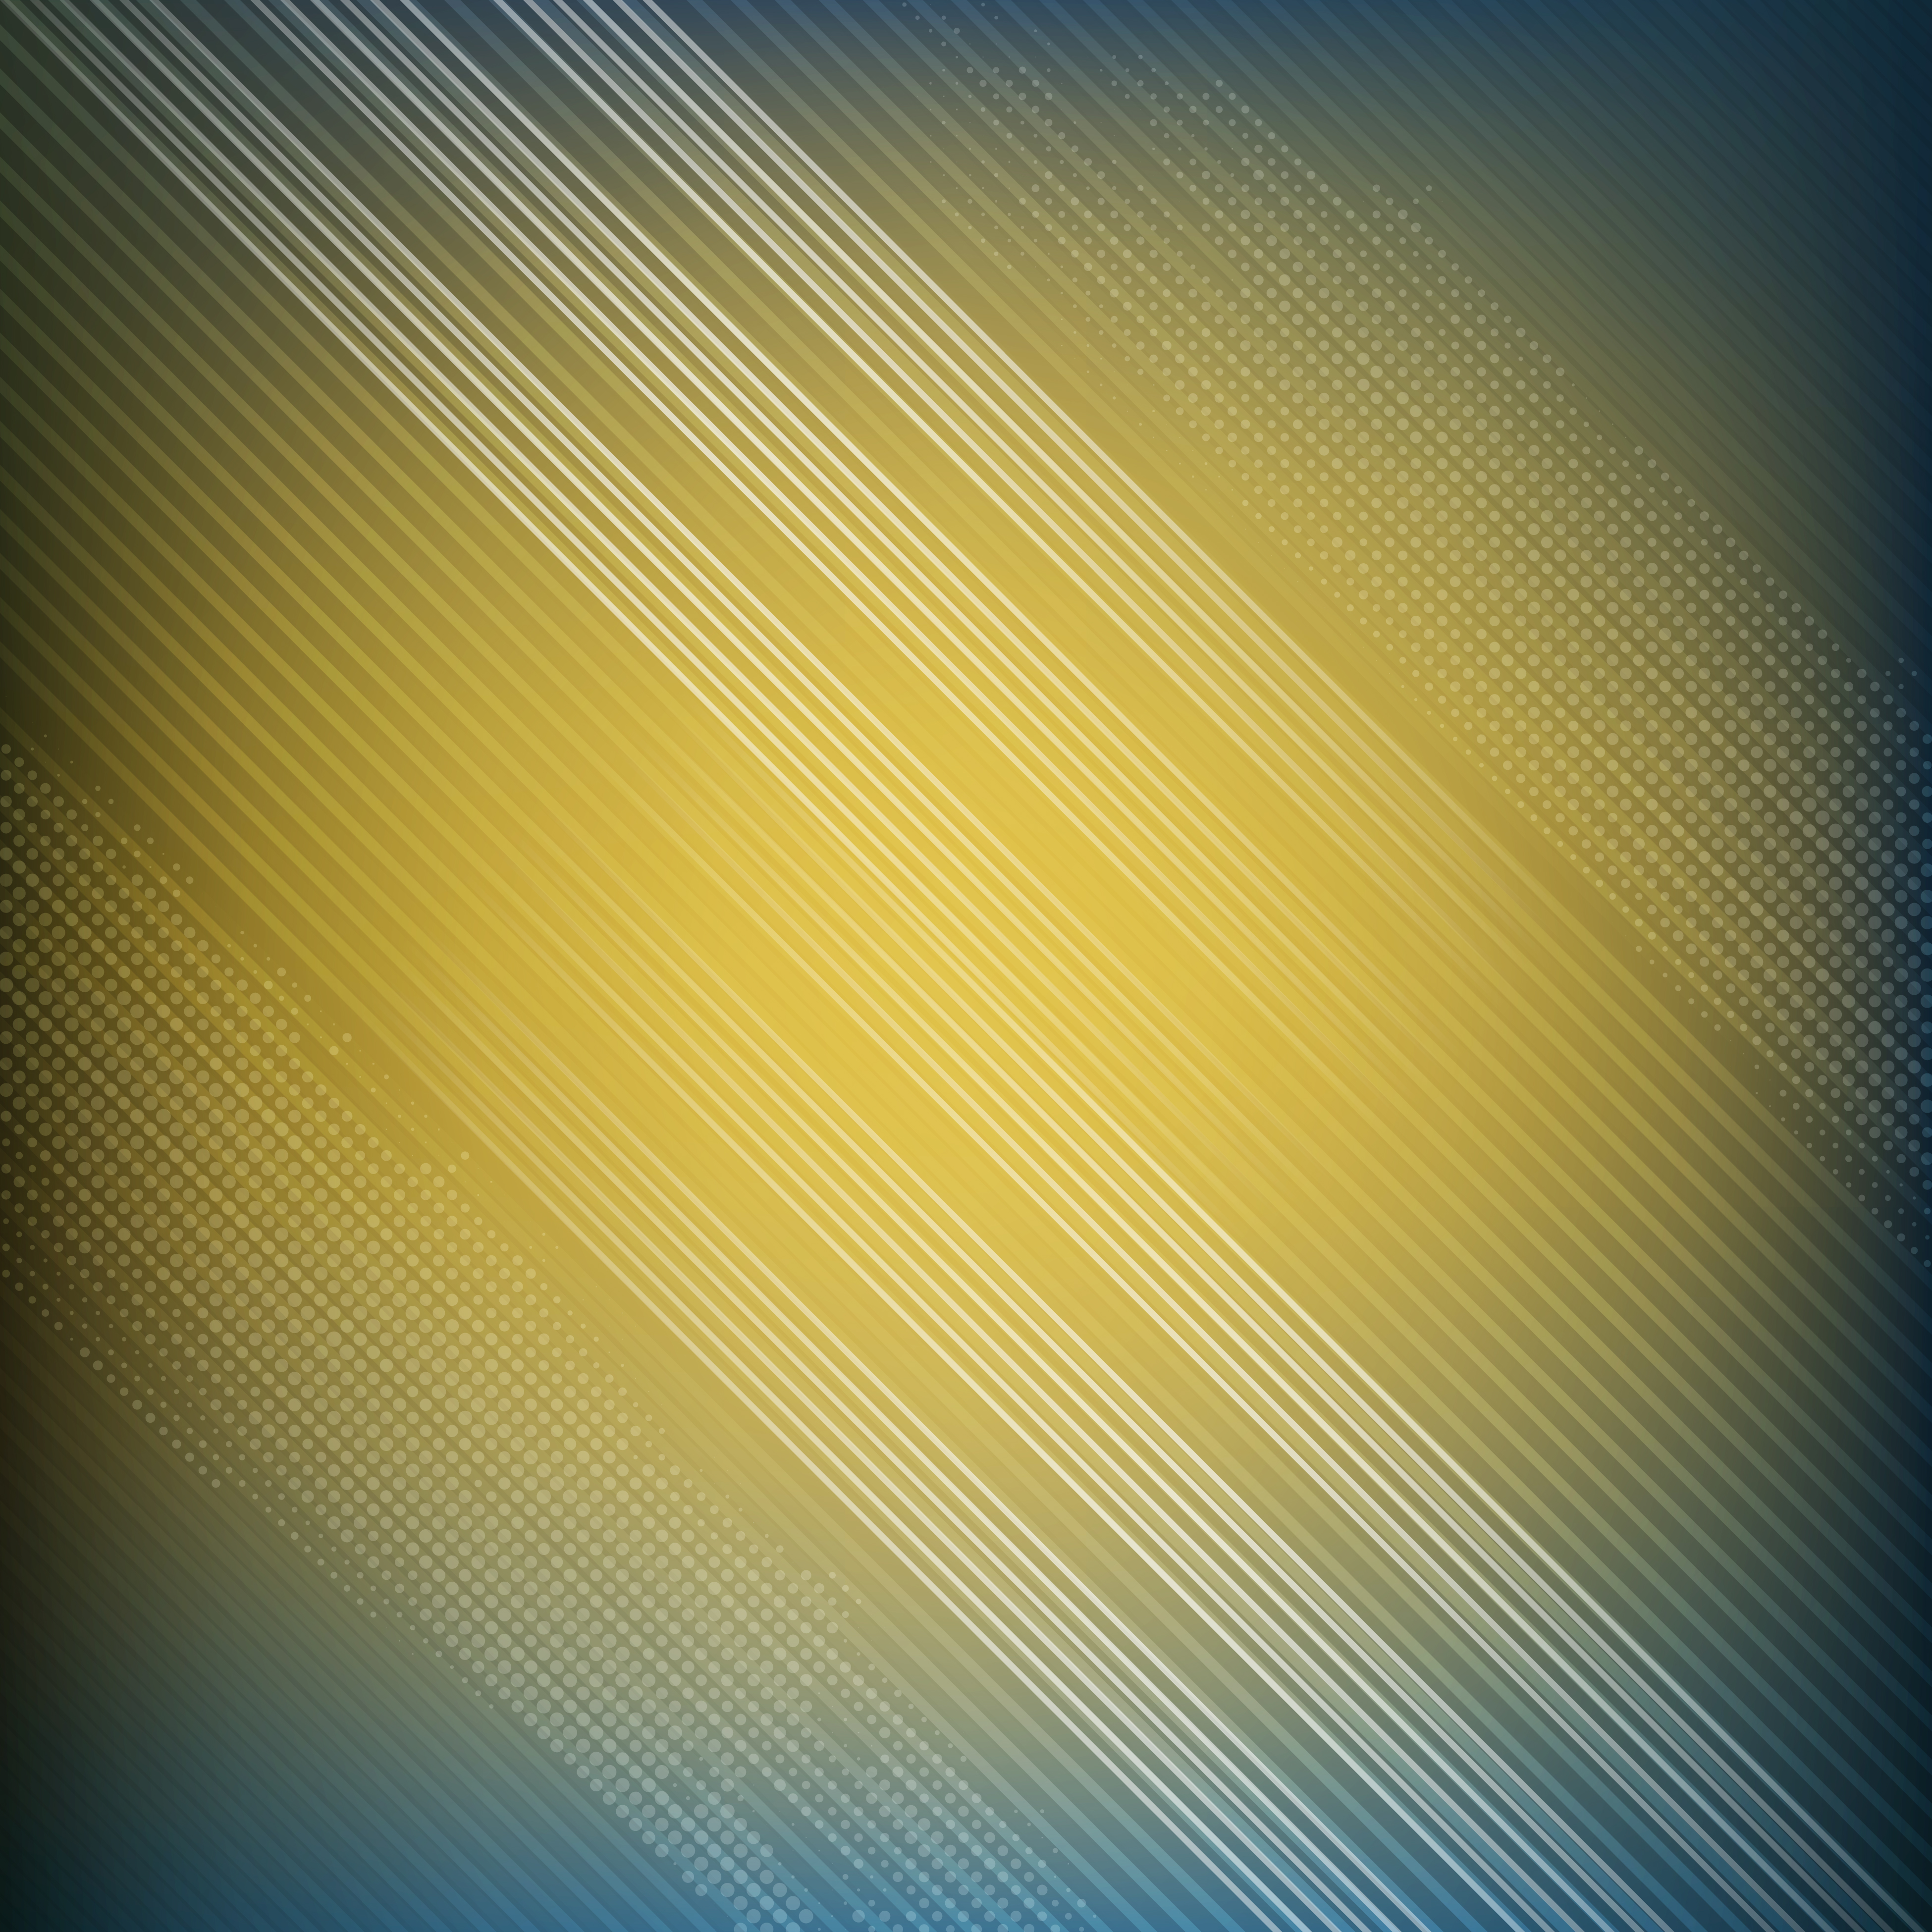 Abstract Elegant Geometric Background Download Free Vectors Clipart Graphics Vector Art